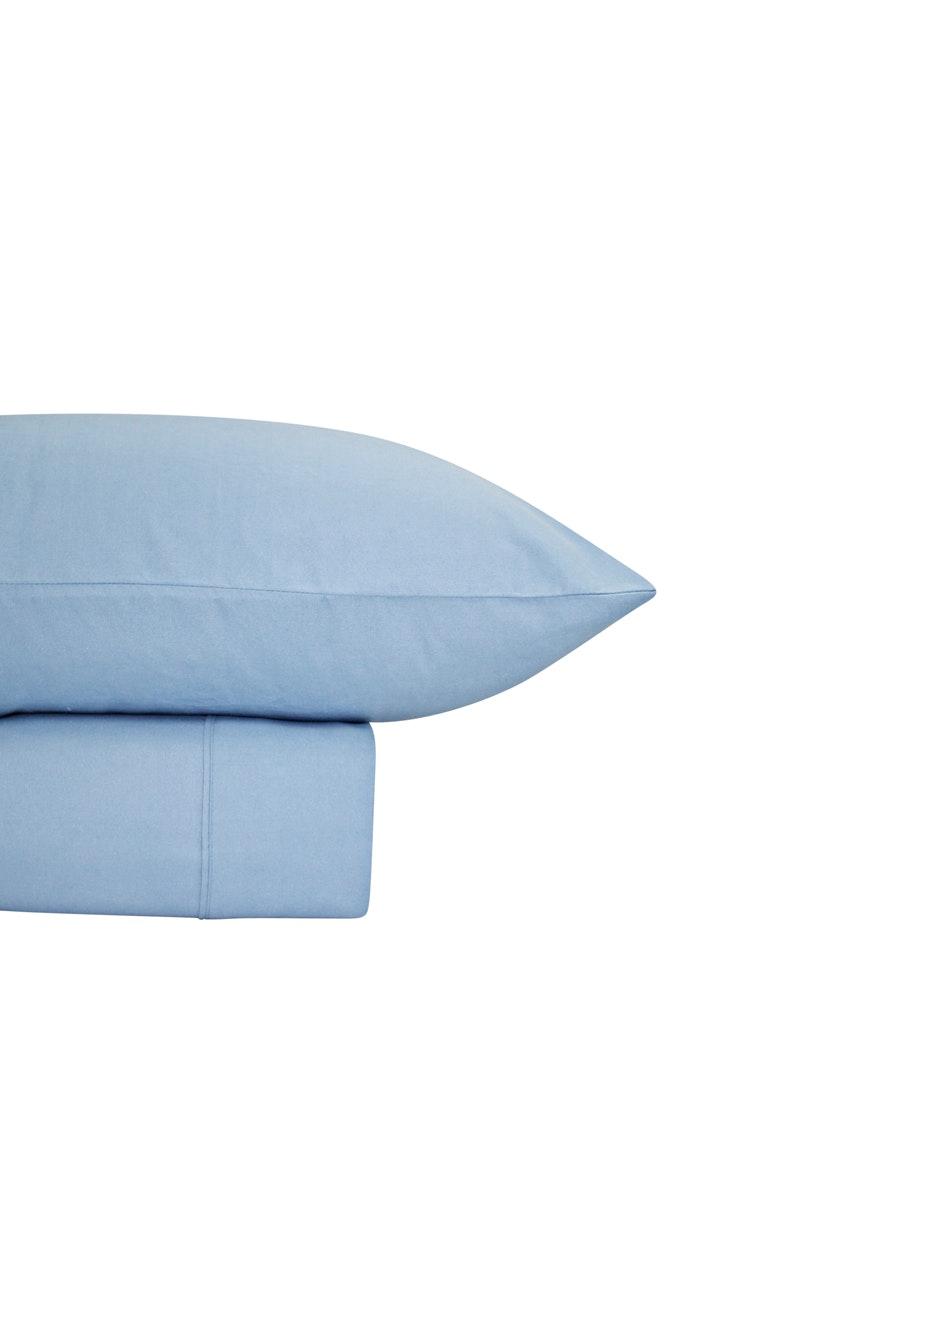 Thermal Flannel Sheet Sets - Bay Blue - King Single Bed